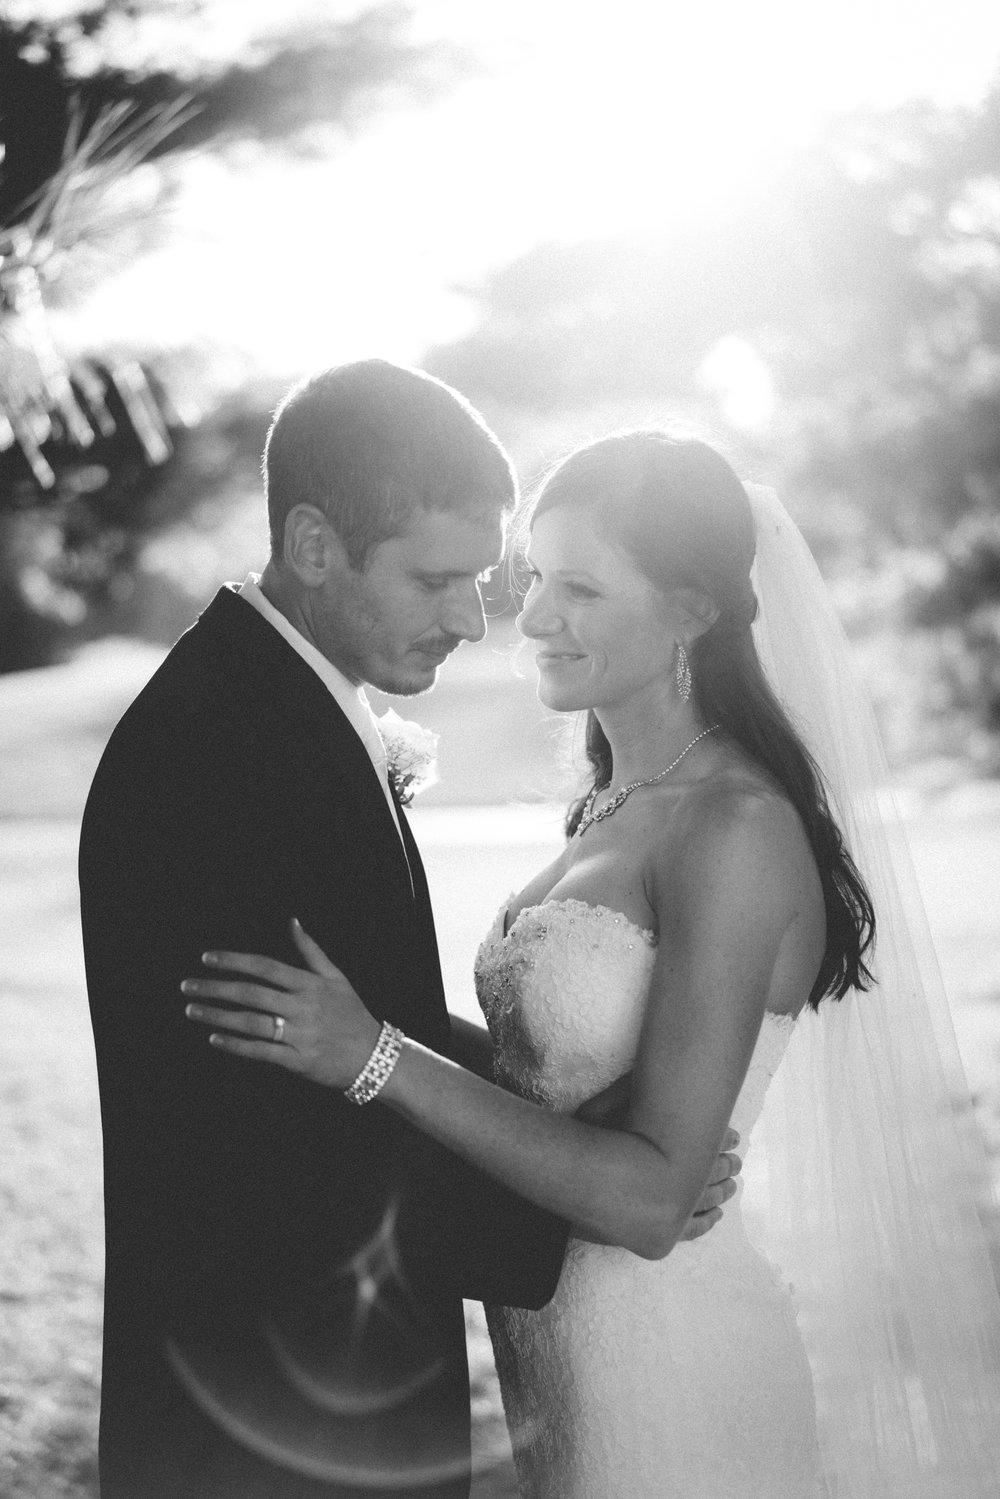 Mike_Steinmetz_Virginia_Wedding_Photographer_Favorites-40.jpg